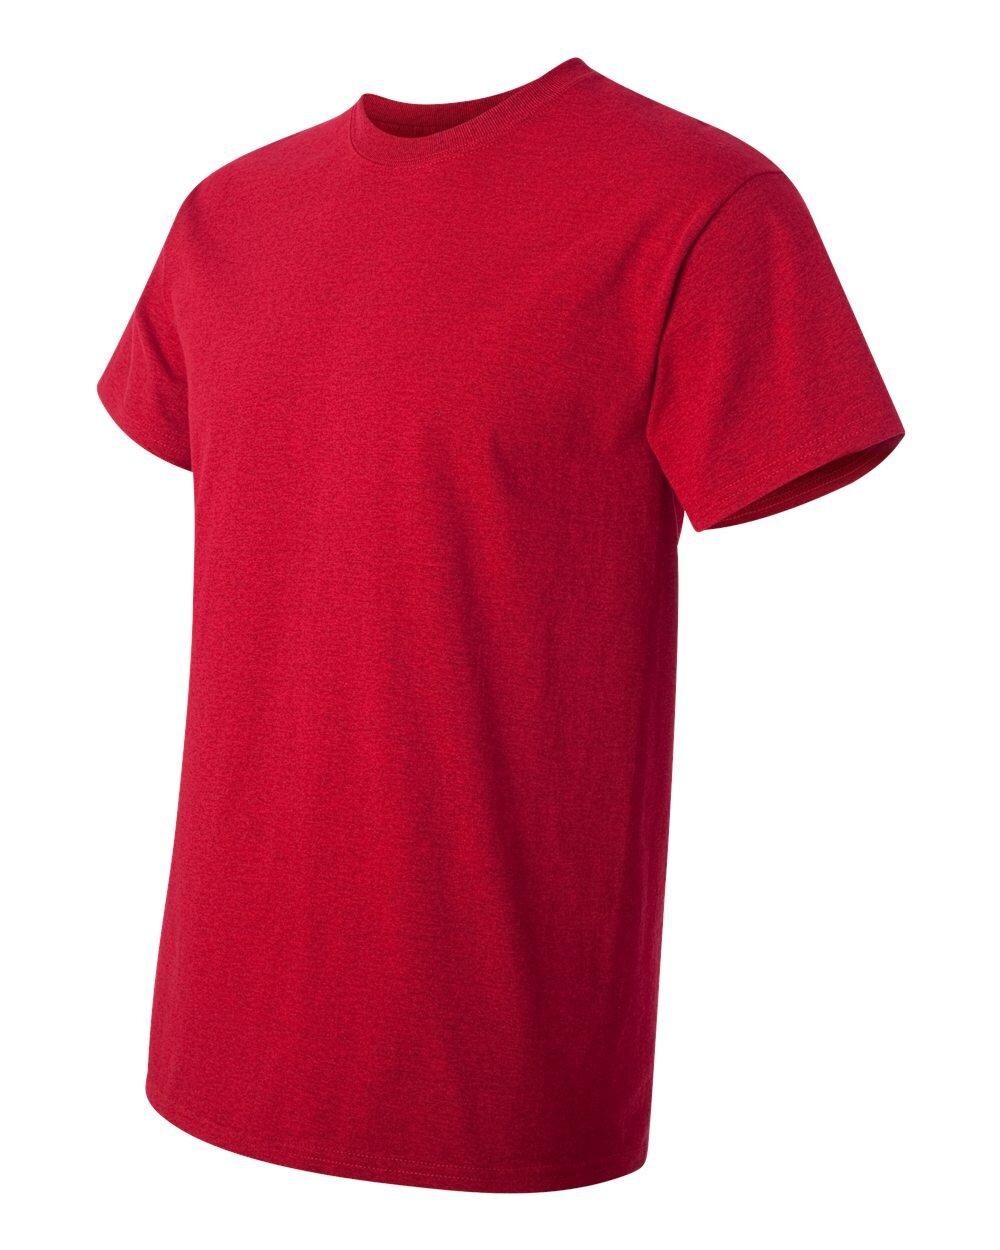 gildan cherry red t shirt